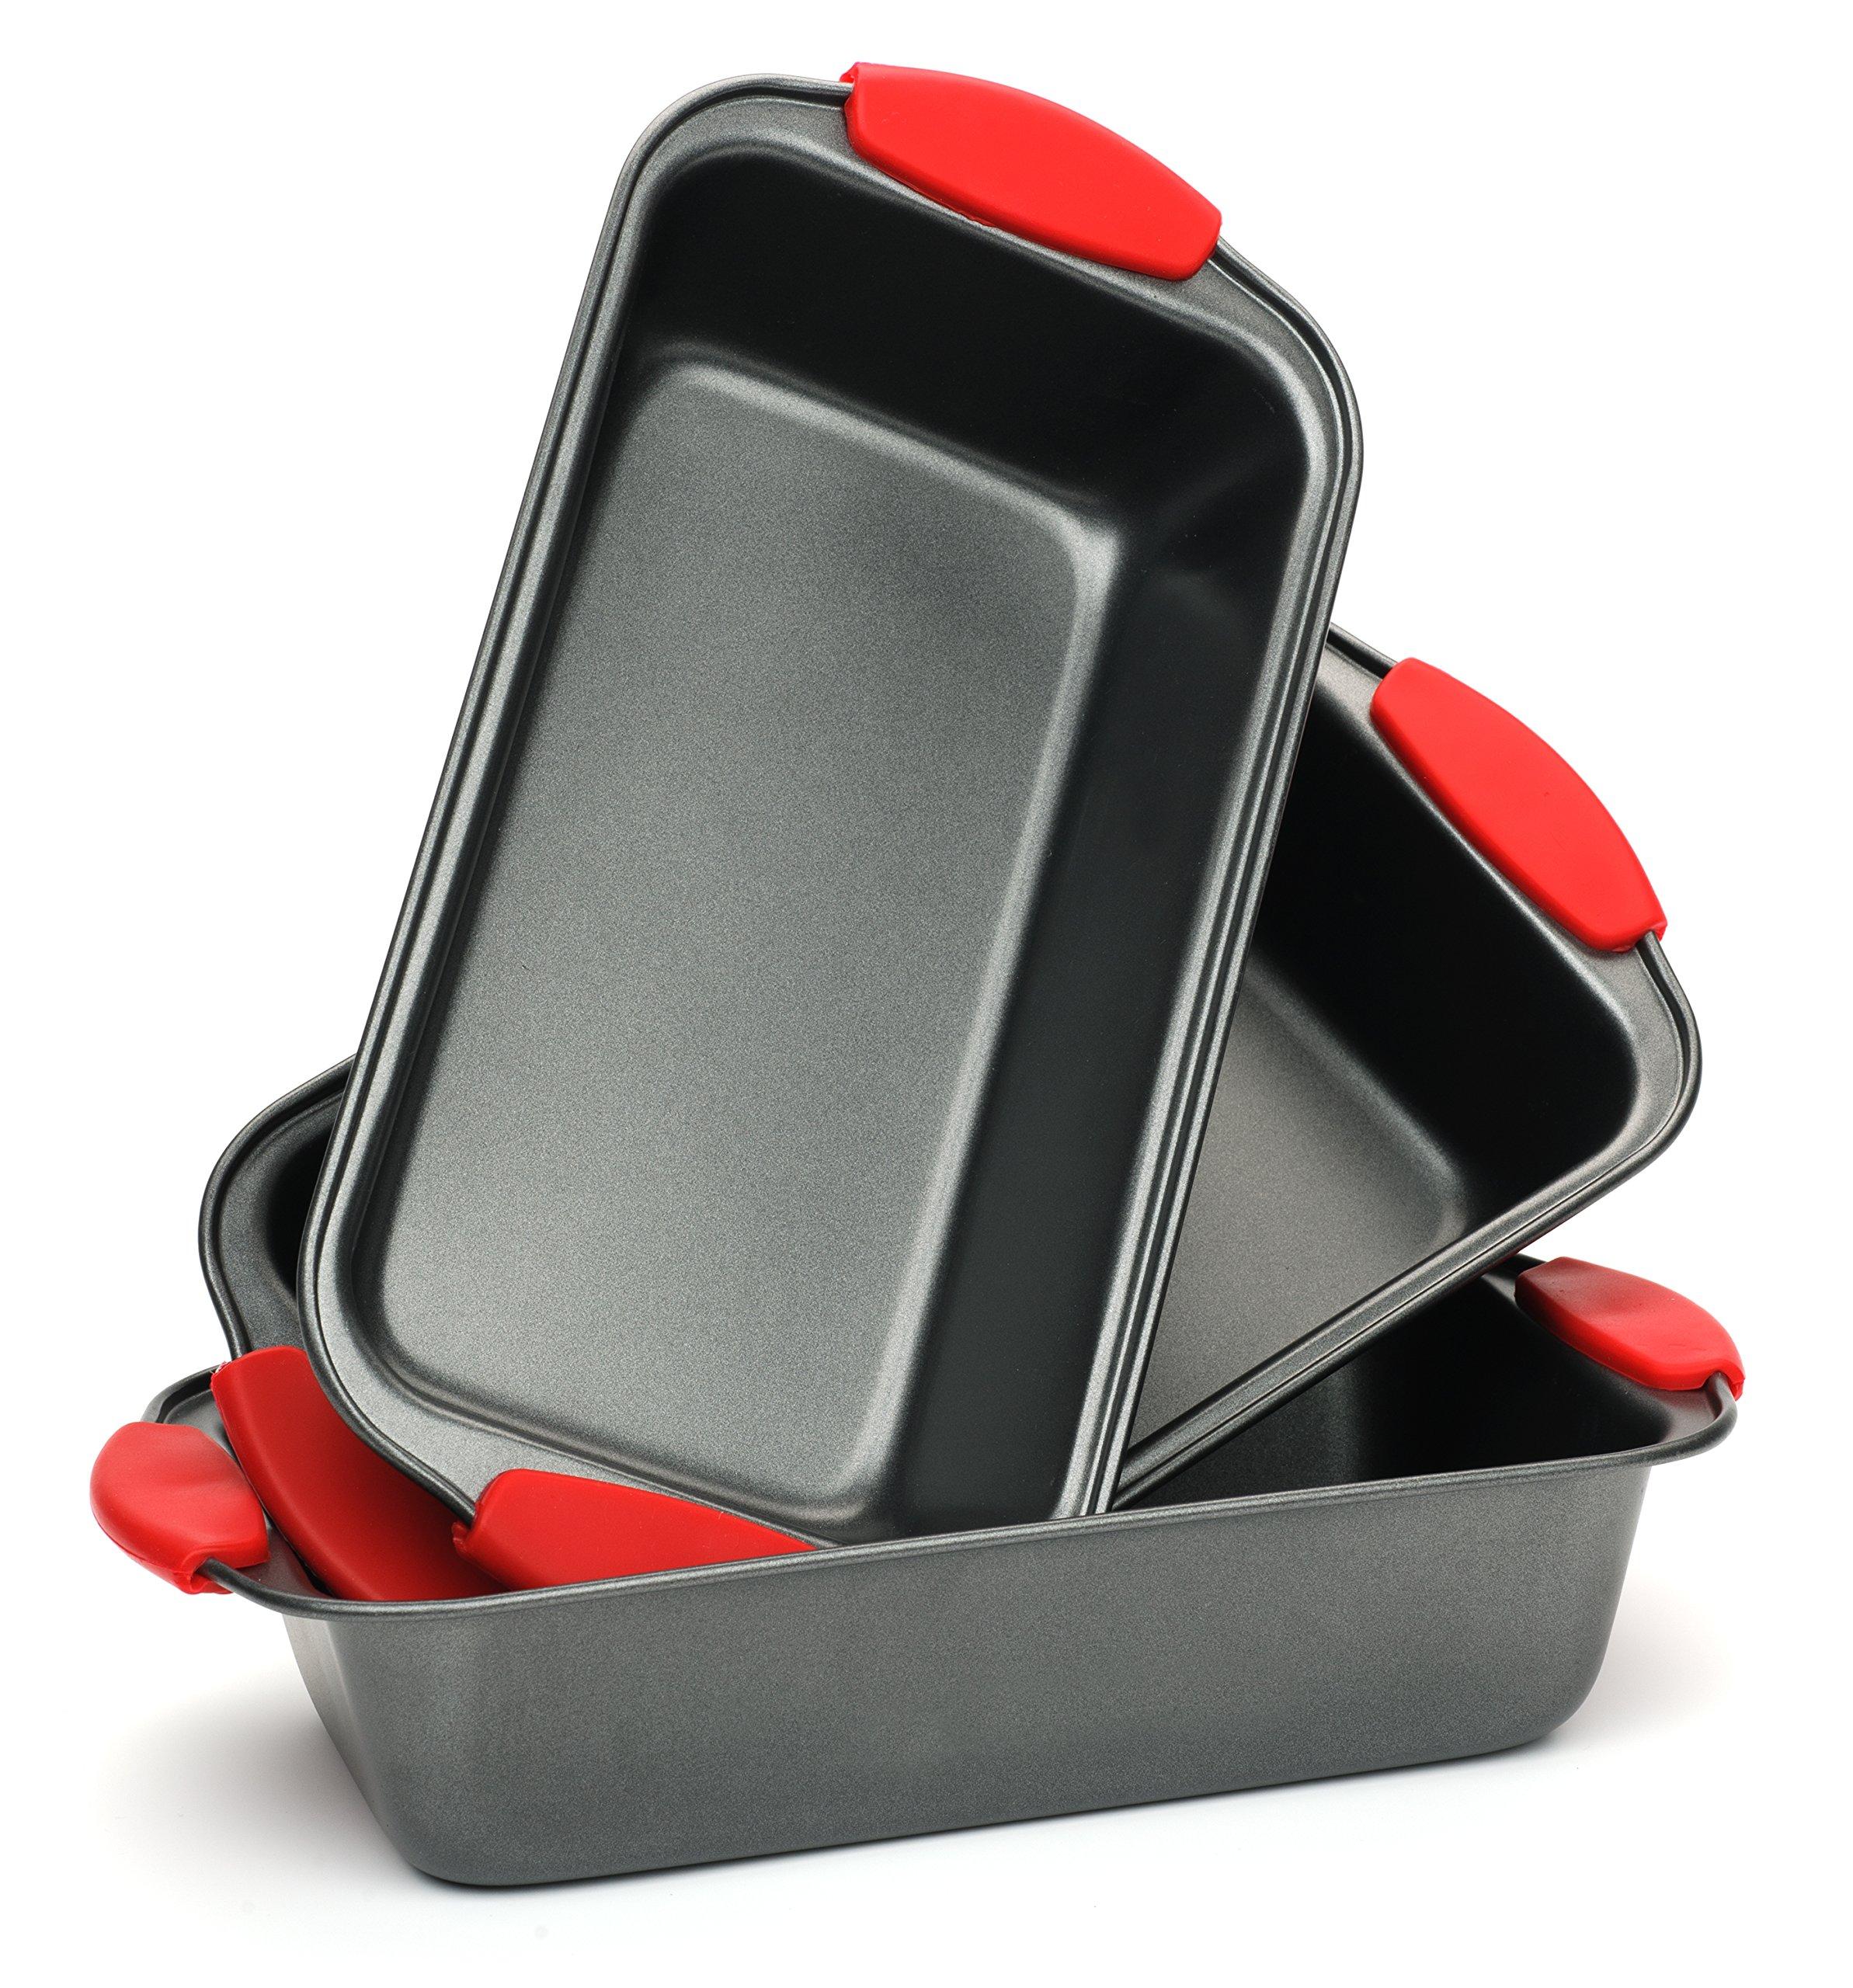 Elite Bakeware 3 Piece NonStick Bread Pan Set - Loaf Pans For Bread - Baking Pans - Bakeware Set by Elite Bakeware (Image #7)